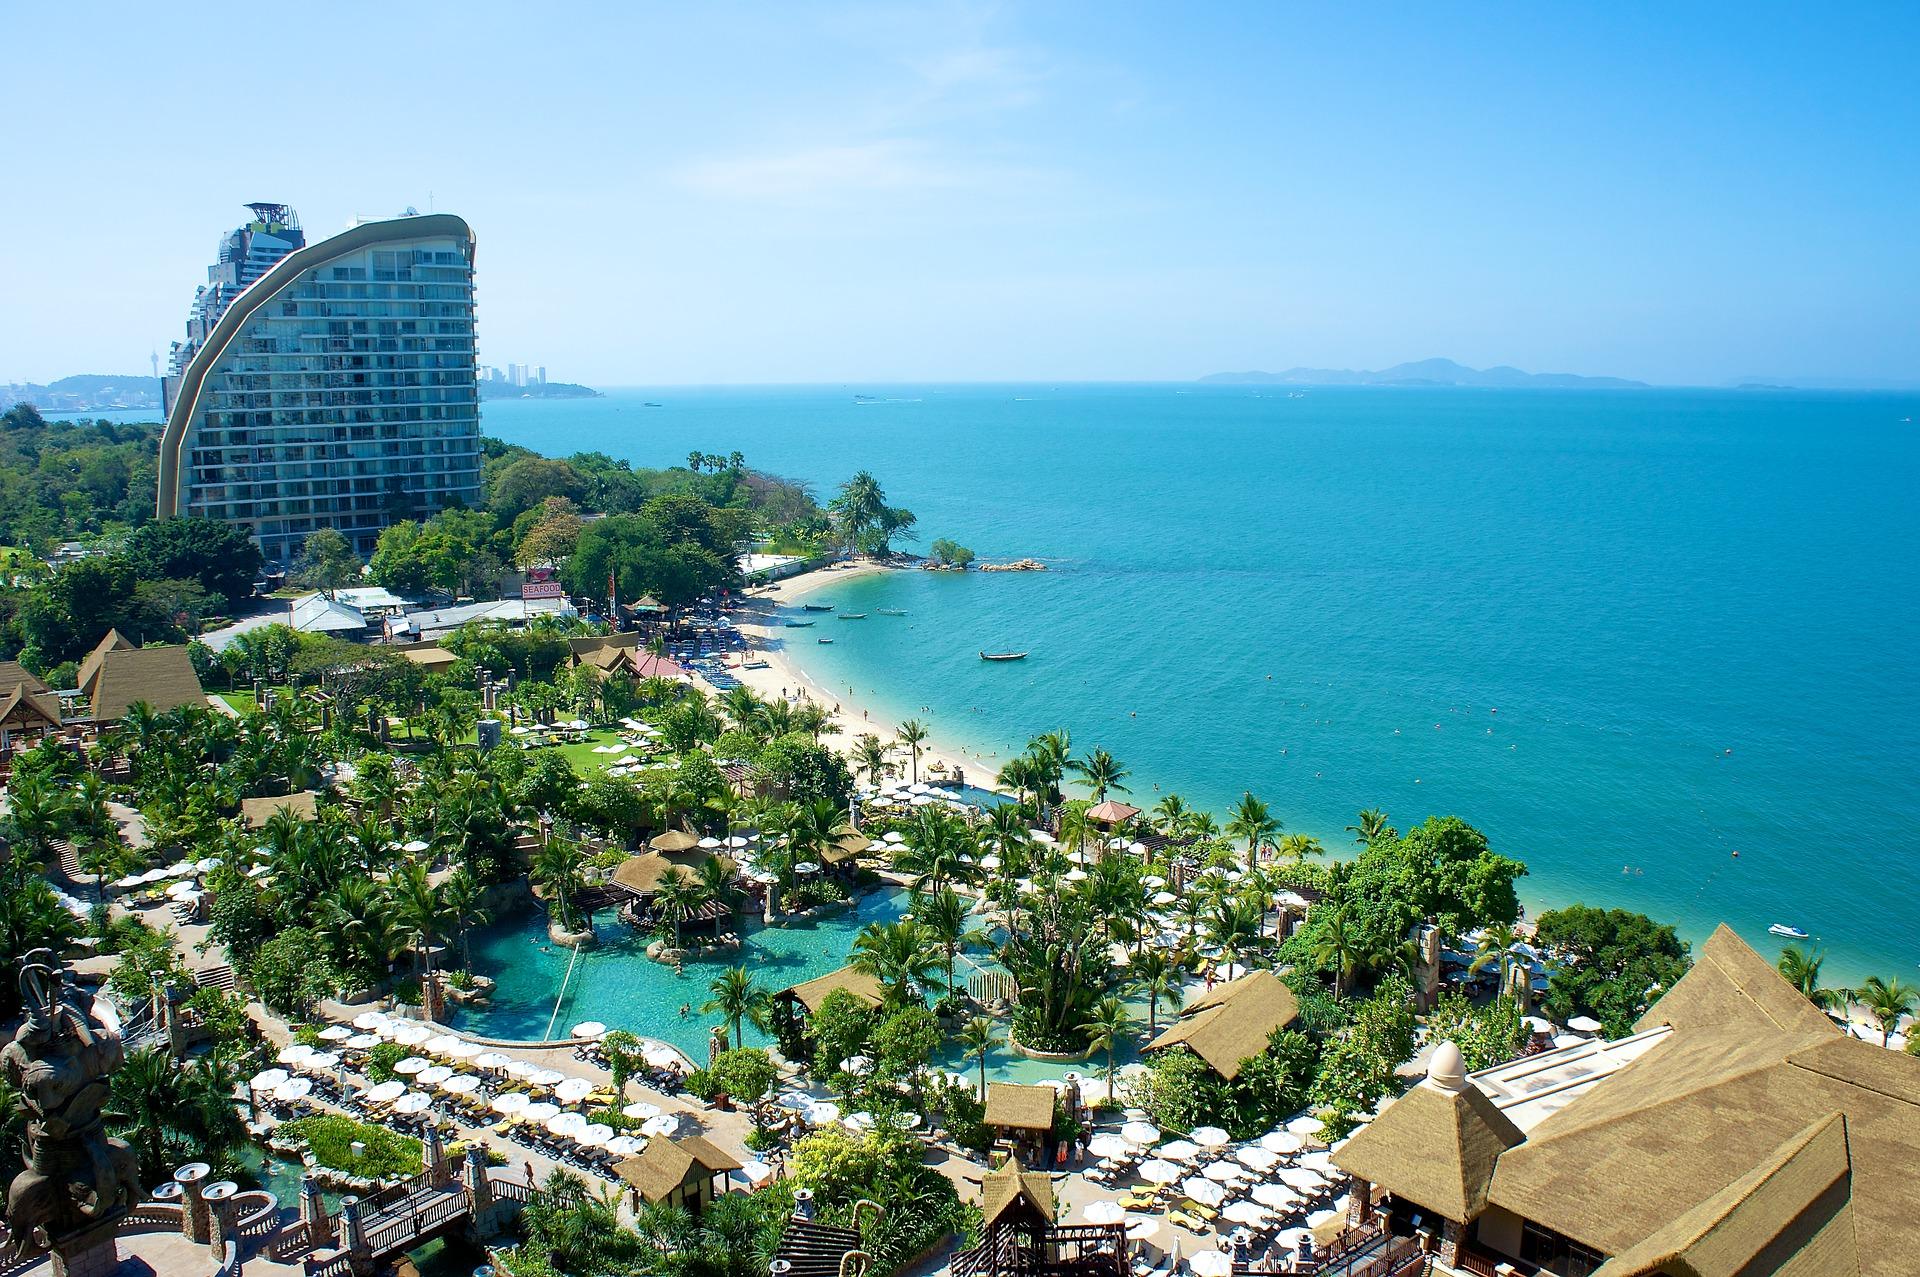 Картинки по запросу Centara Grand Mirage Beach Resort